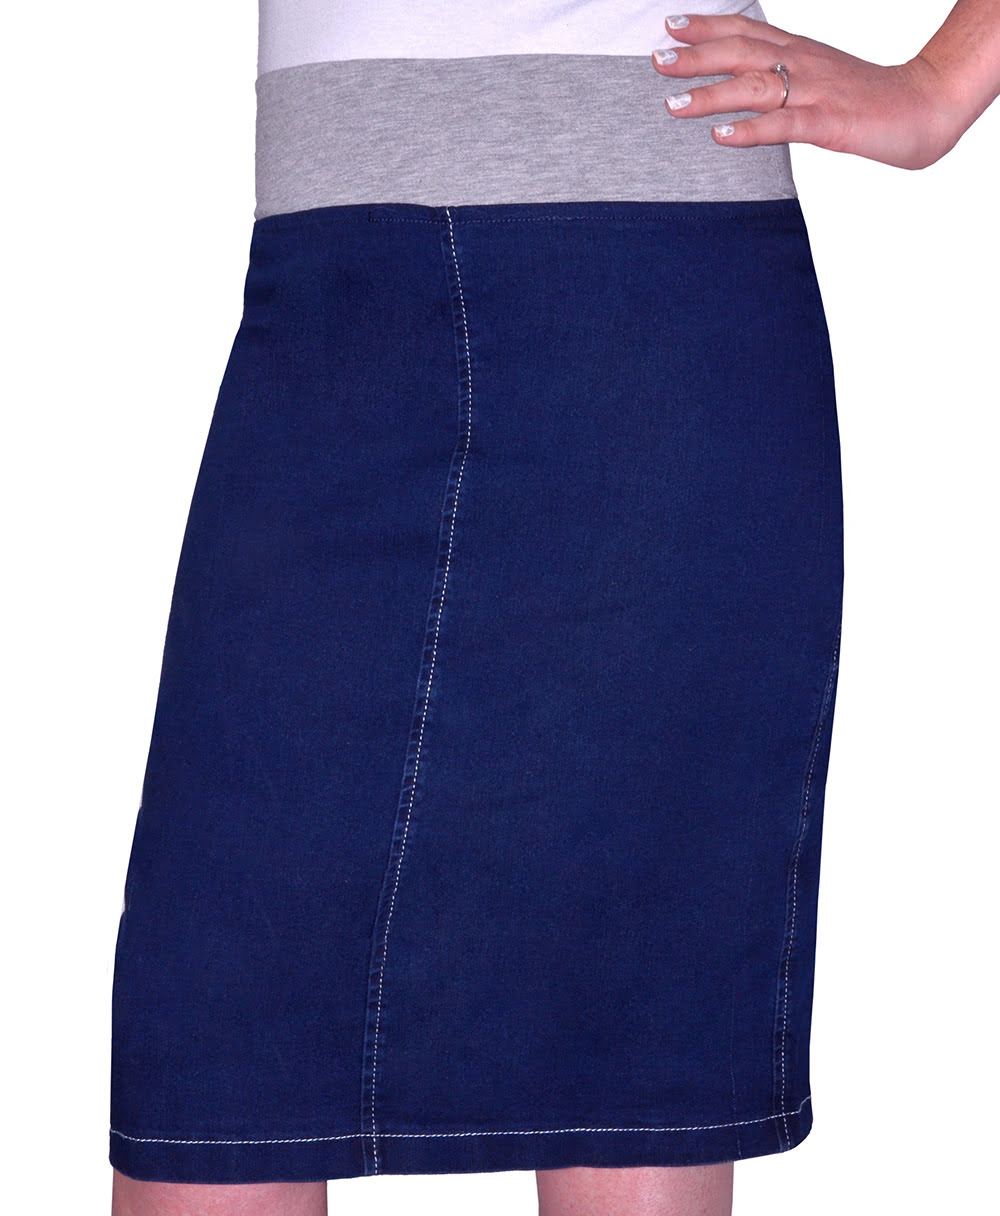 6408085ce1a8c 1490. Women s Straight Knee Length Denim Skirt with Stretch Waistband